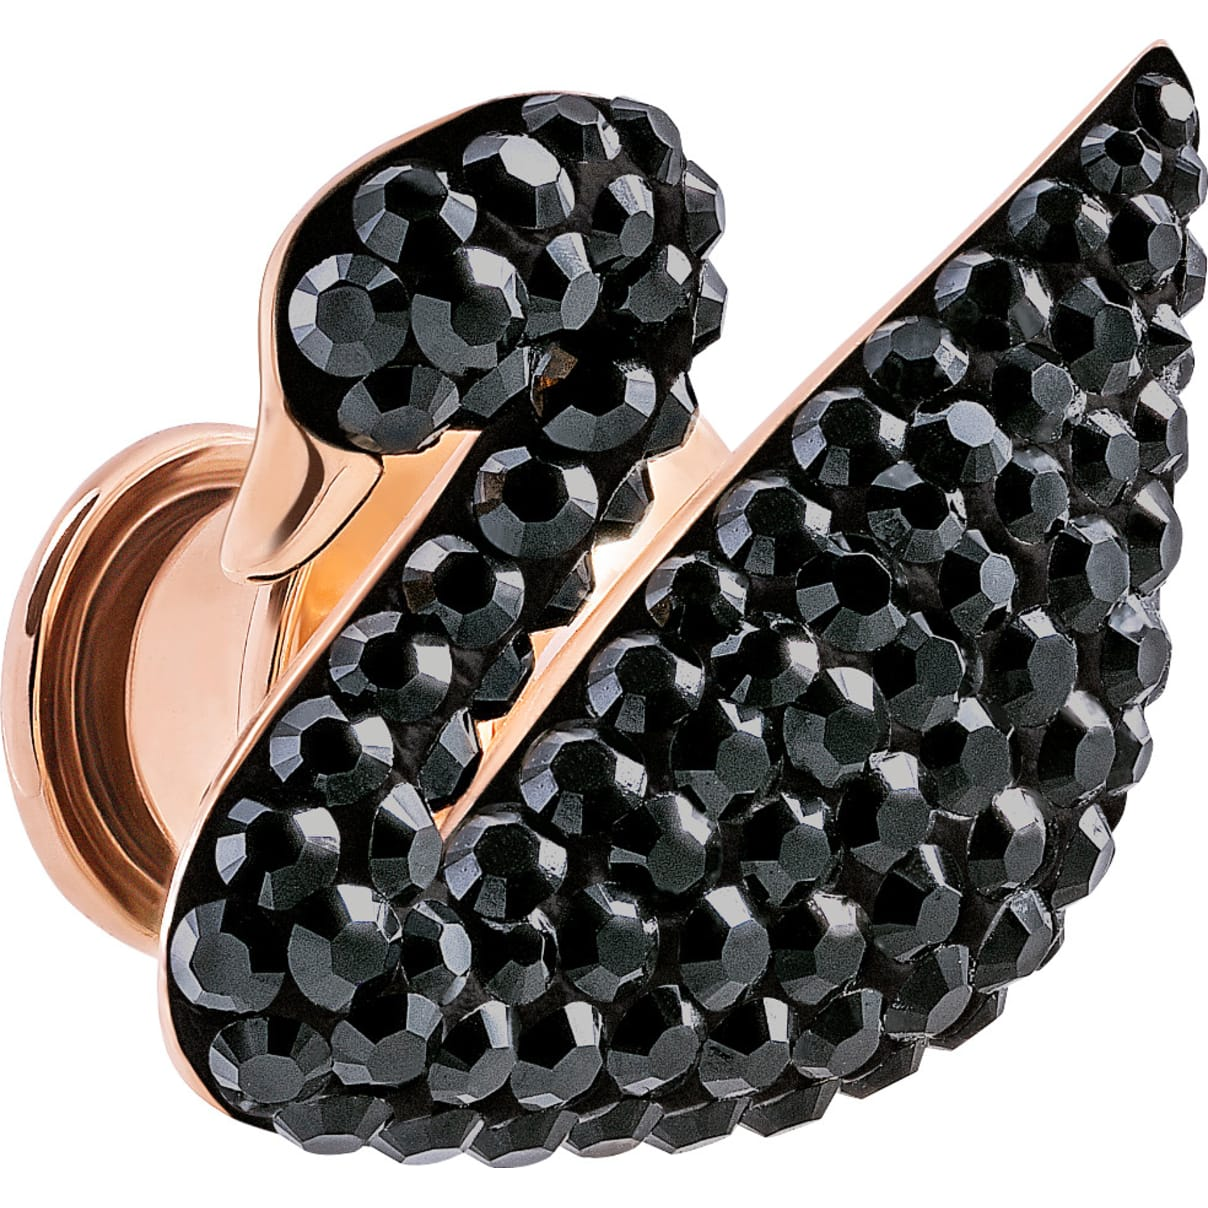 Swarovski Iconic Swan Tack Pin, Black, Rose-gold tone plated